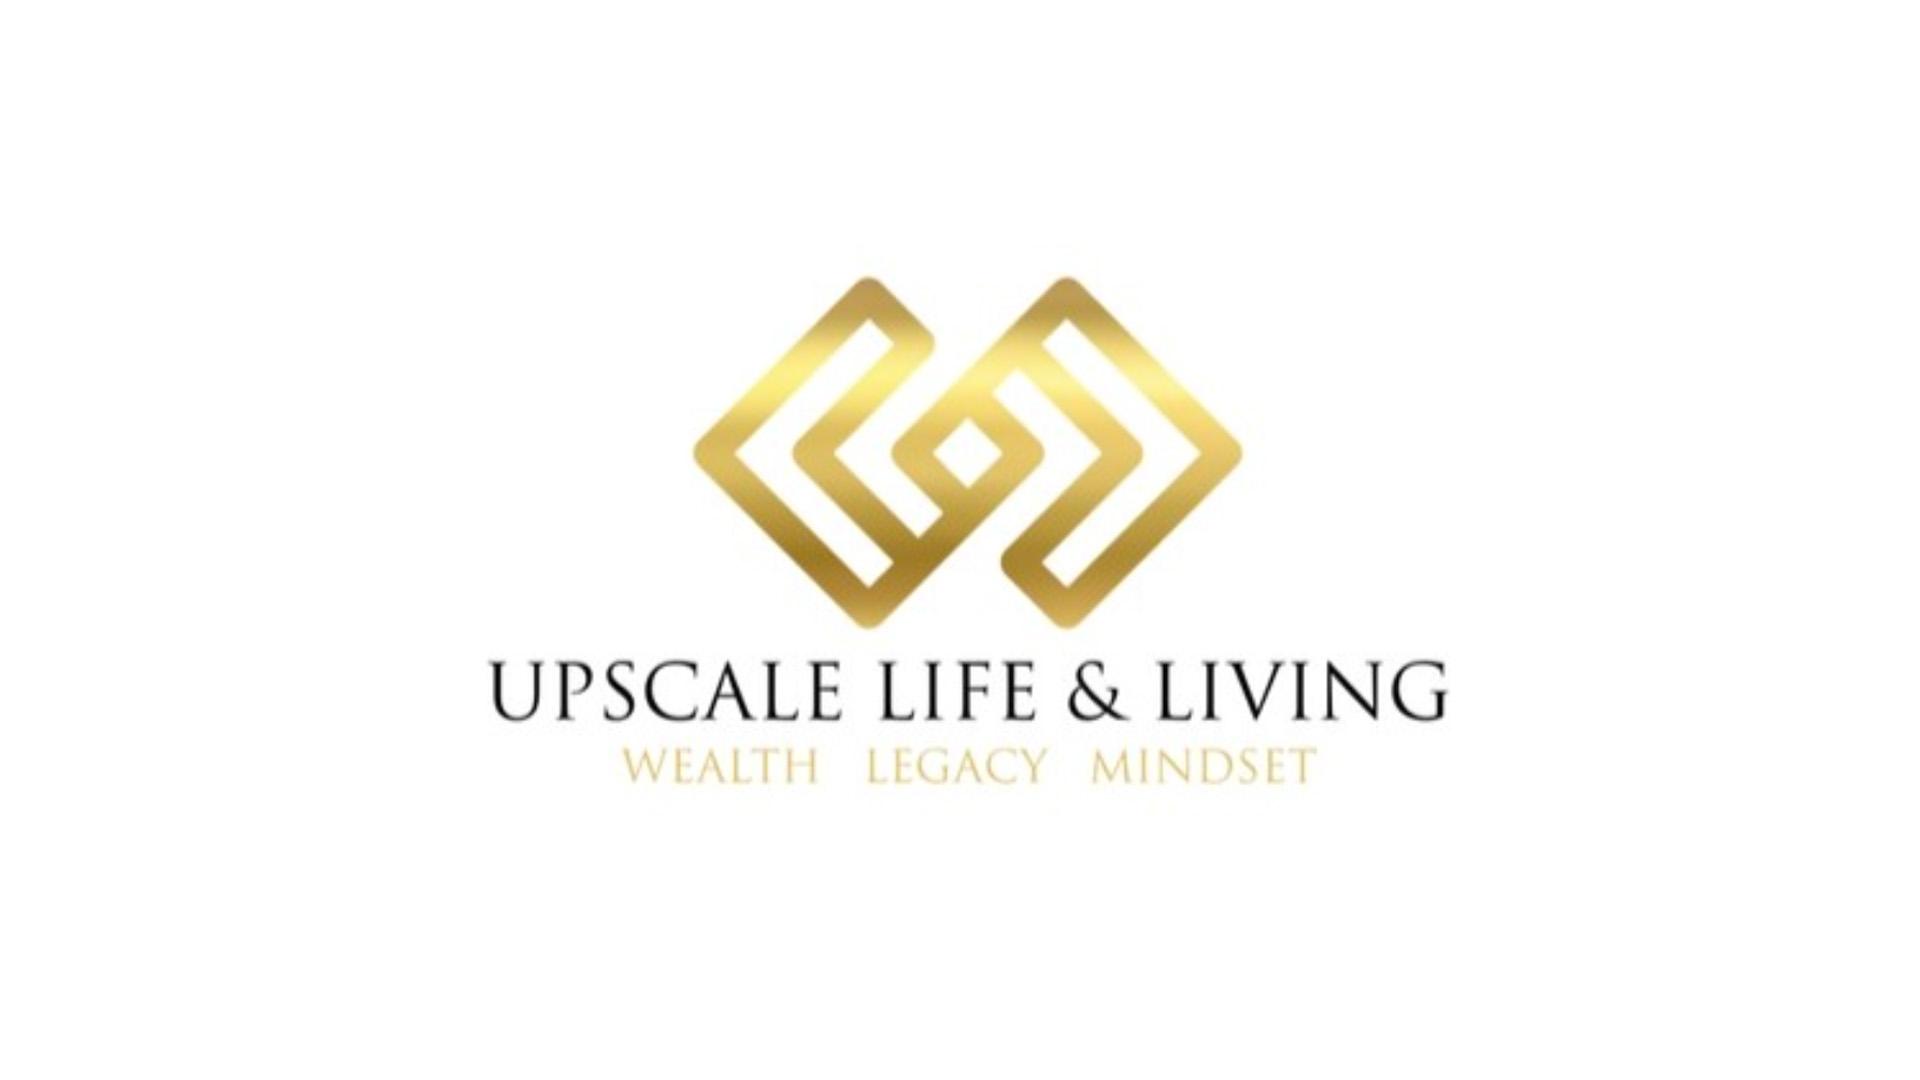 Upscale Life & Living Institute LLC